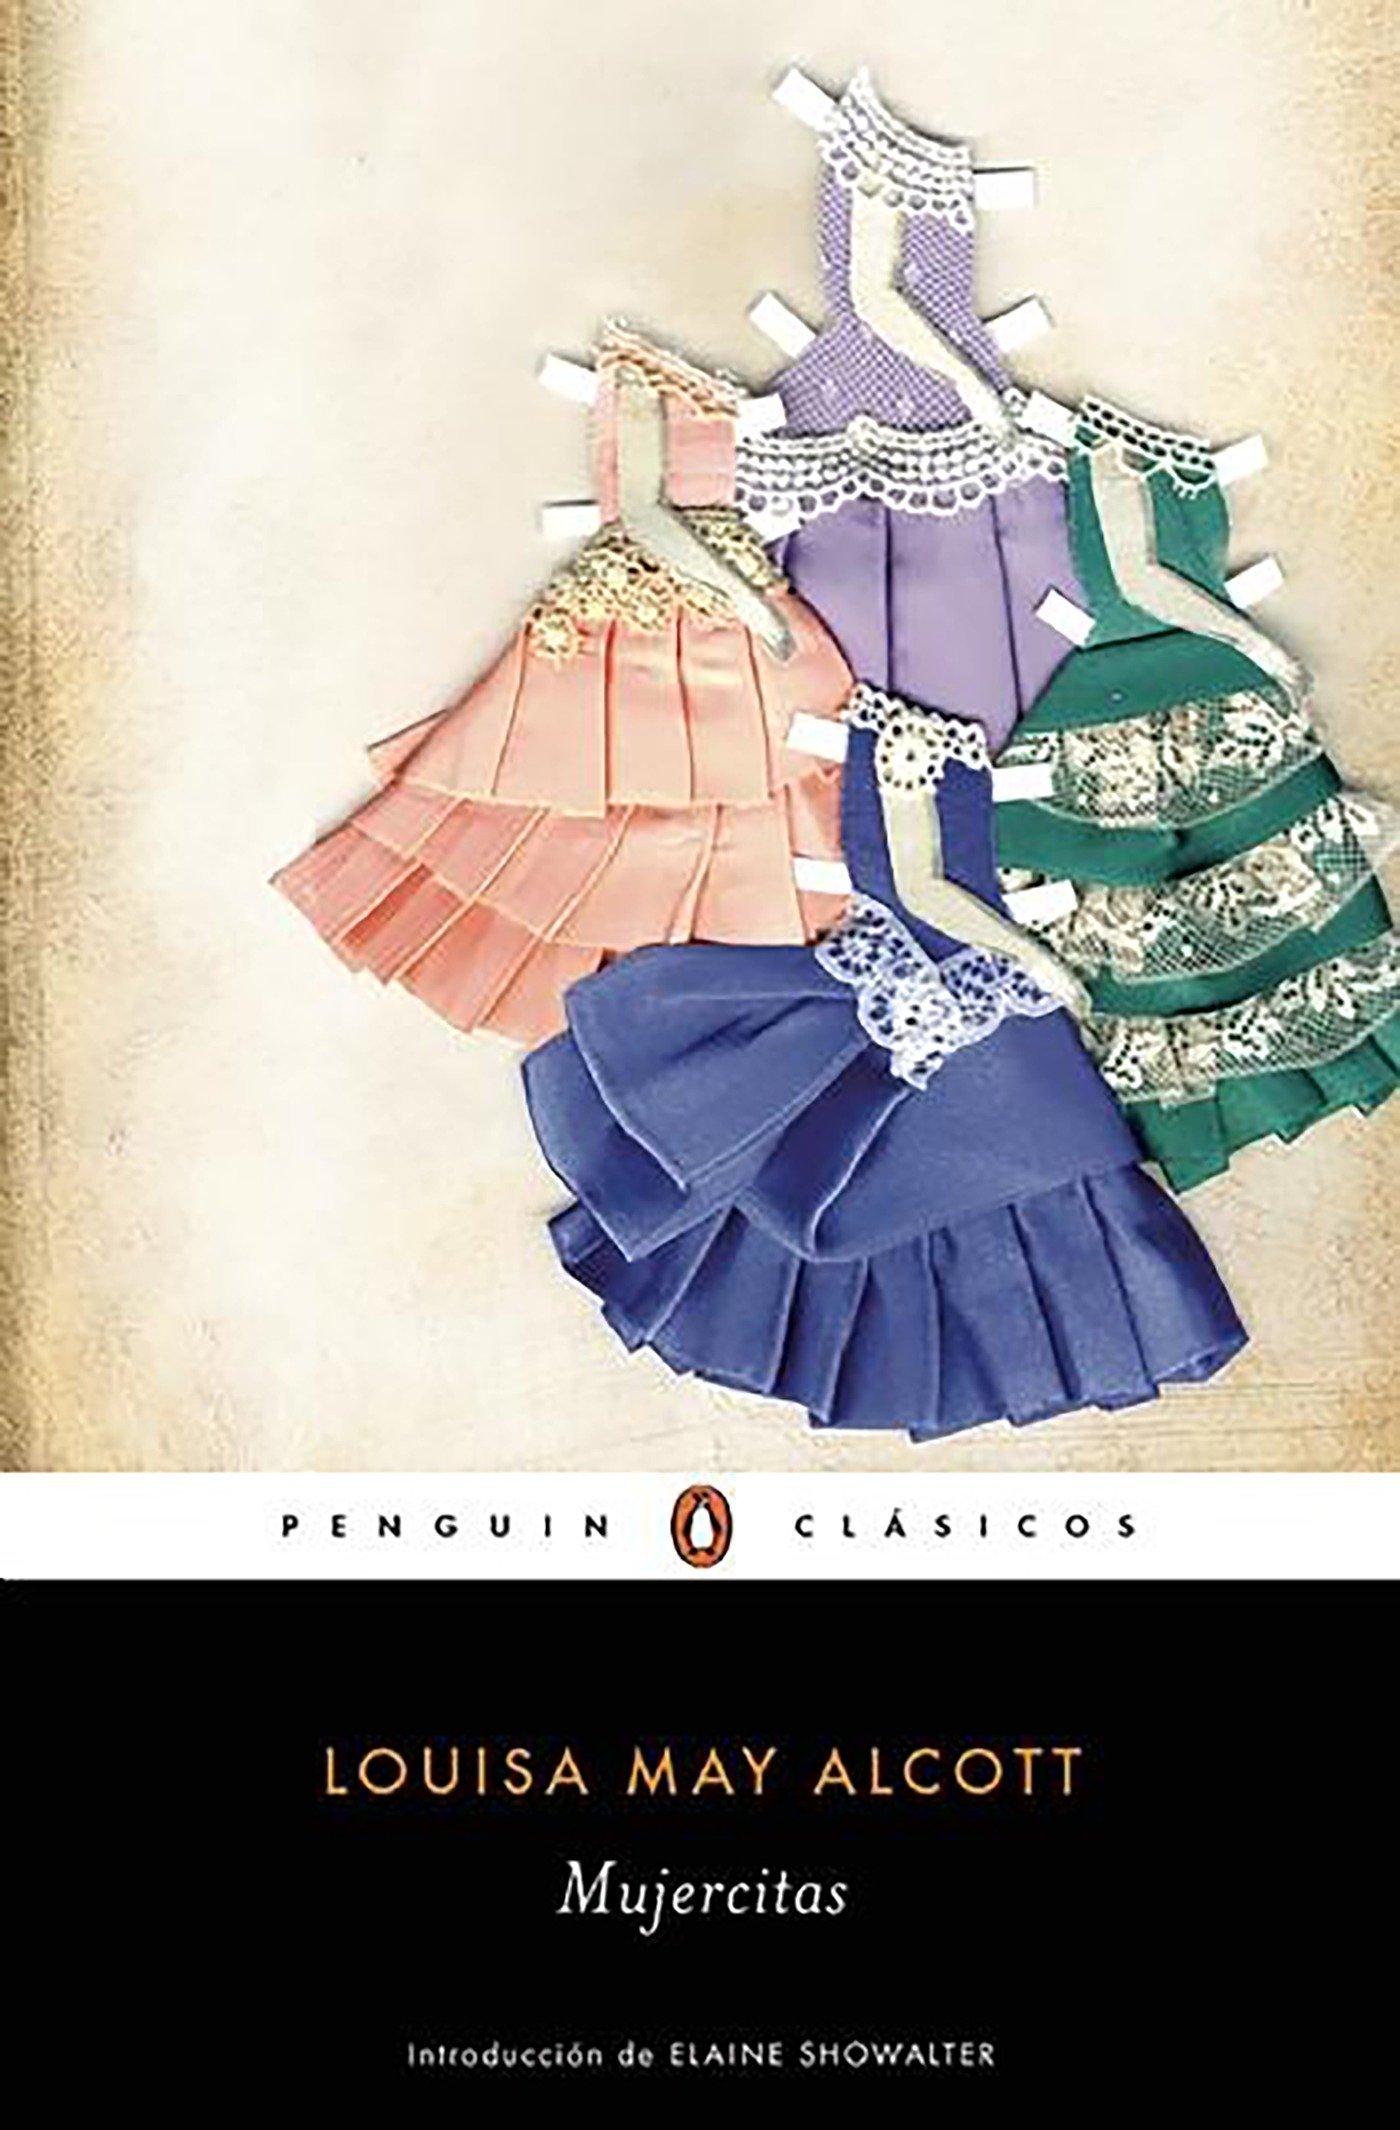 Mujercitas Little Women Penguin Clásicos Spanish Edition Alcott Louisa May 9788491050476 Books